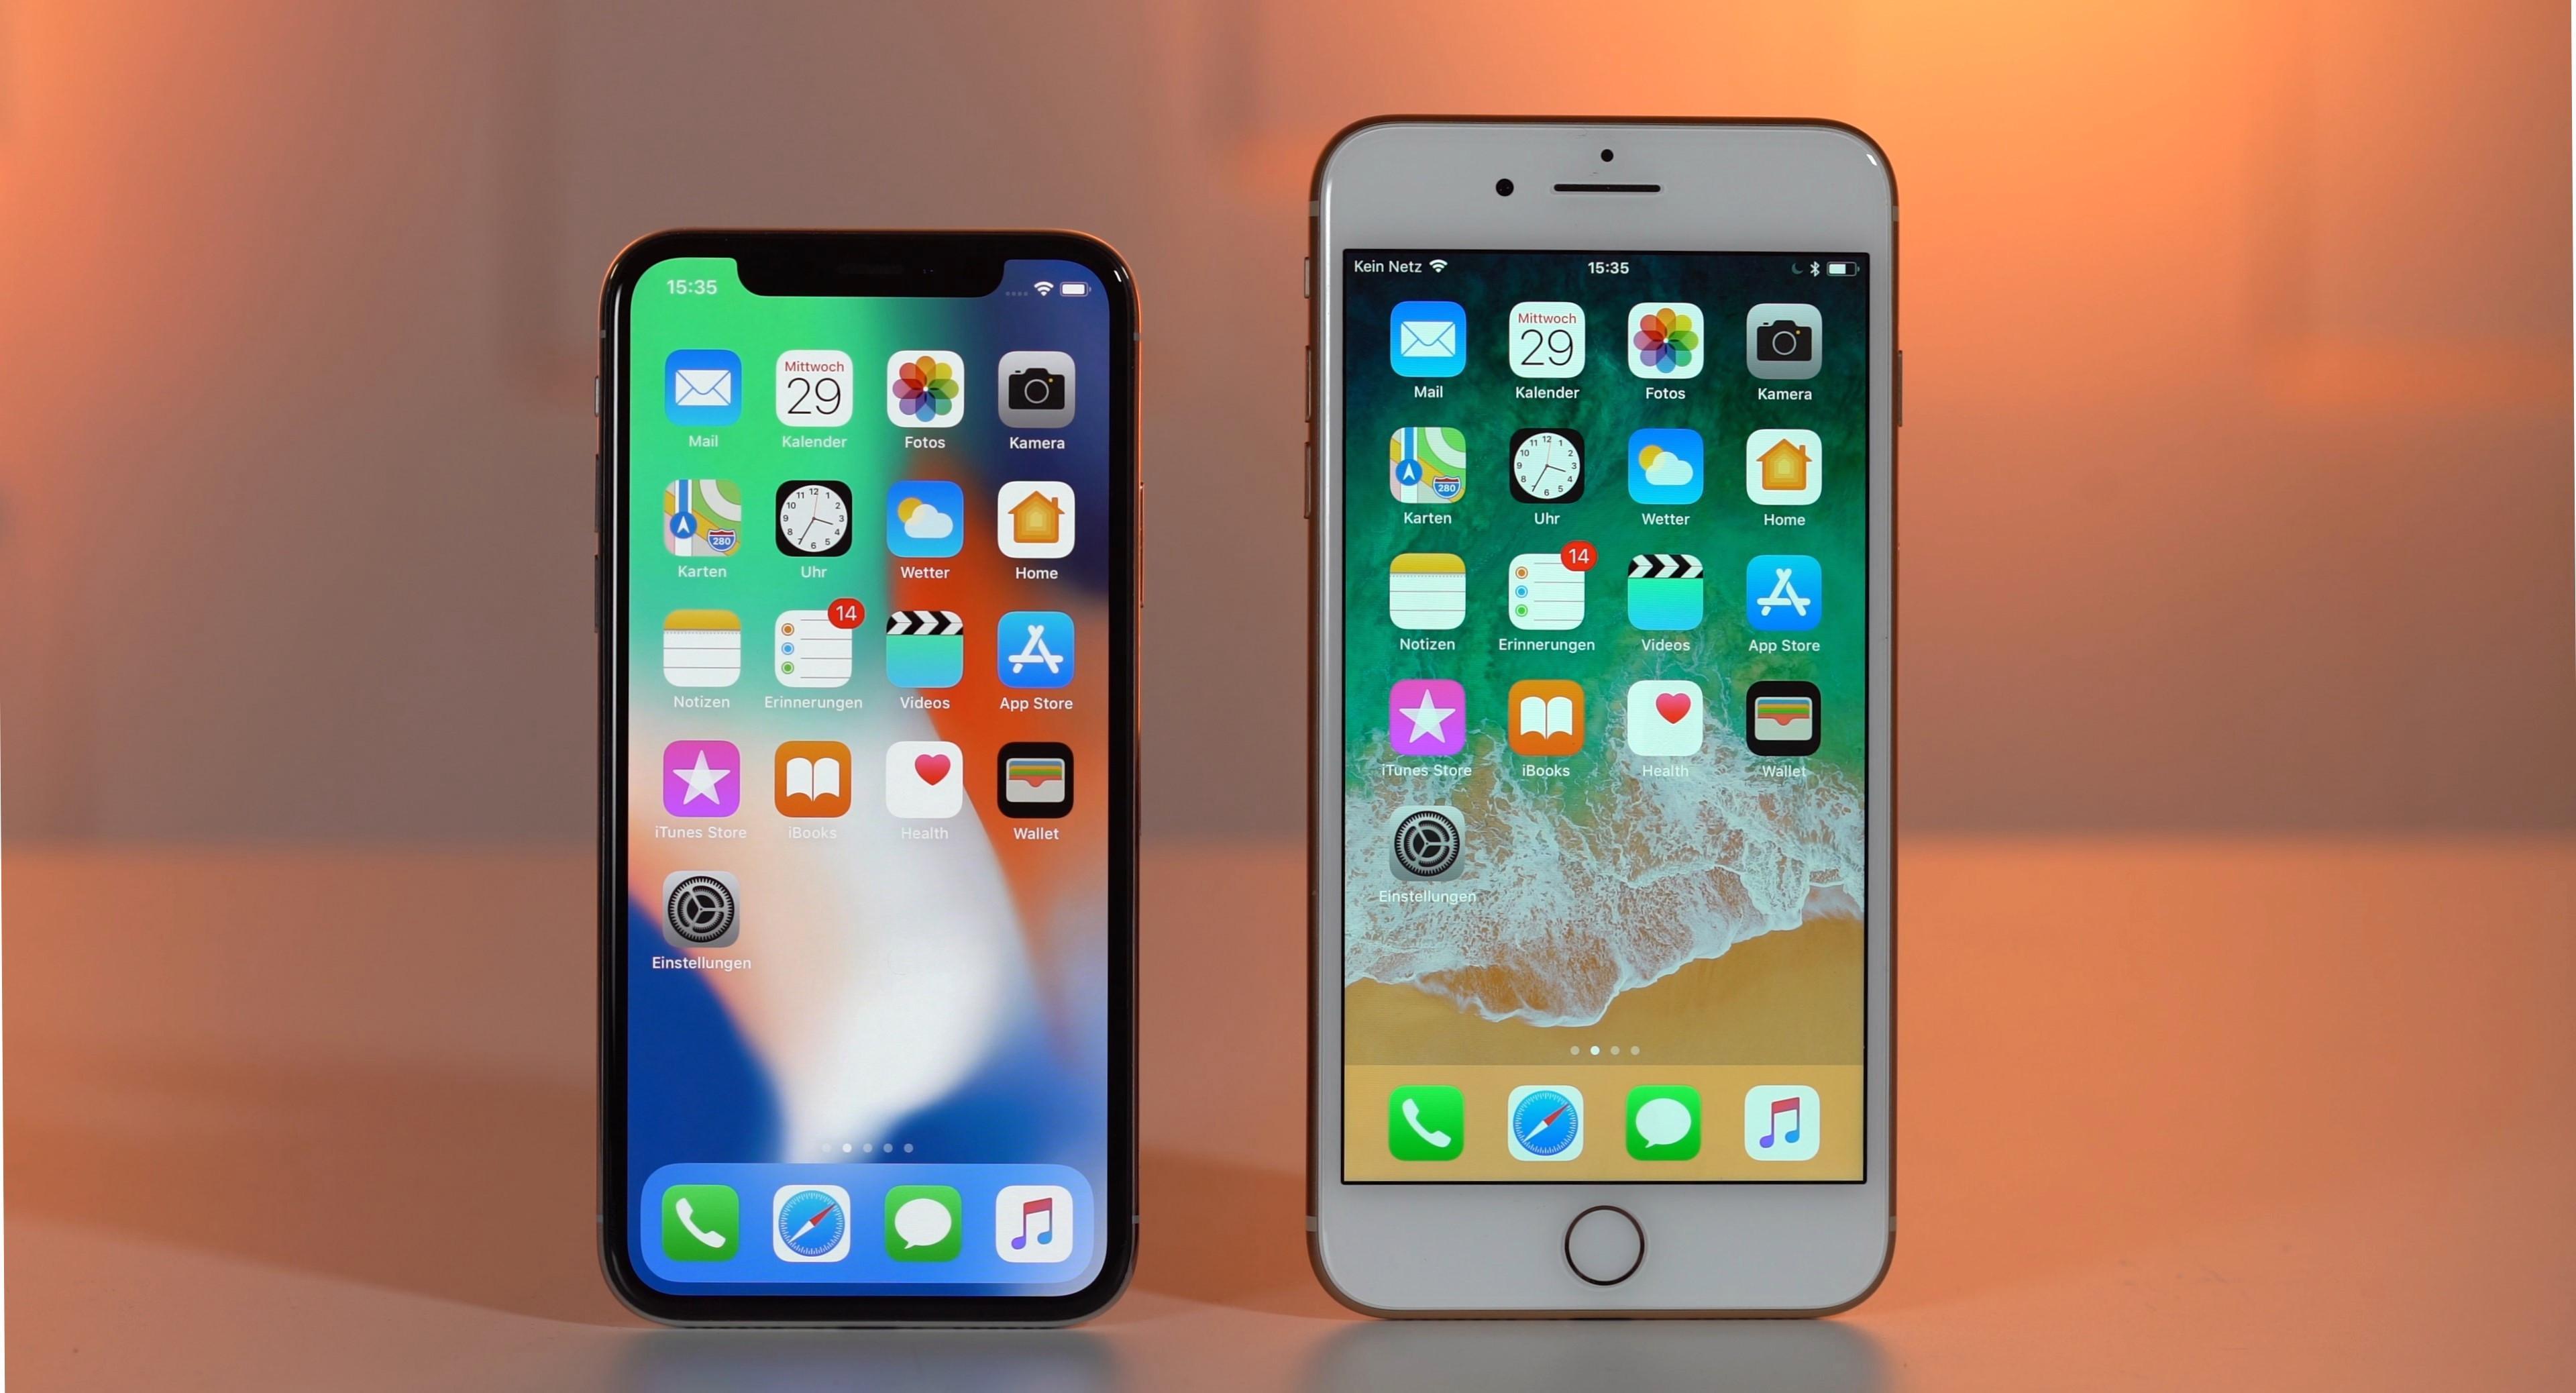 Iphone Moving Wallpaper - Iphone X Vs Iphone 6 - HD Wallpaper